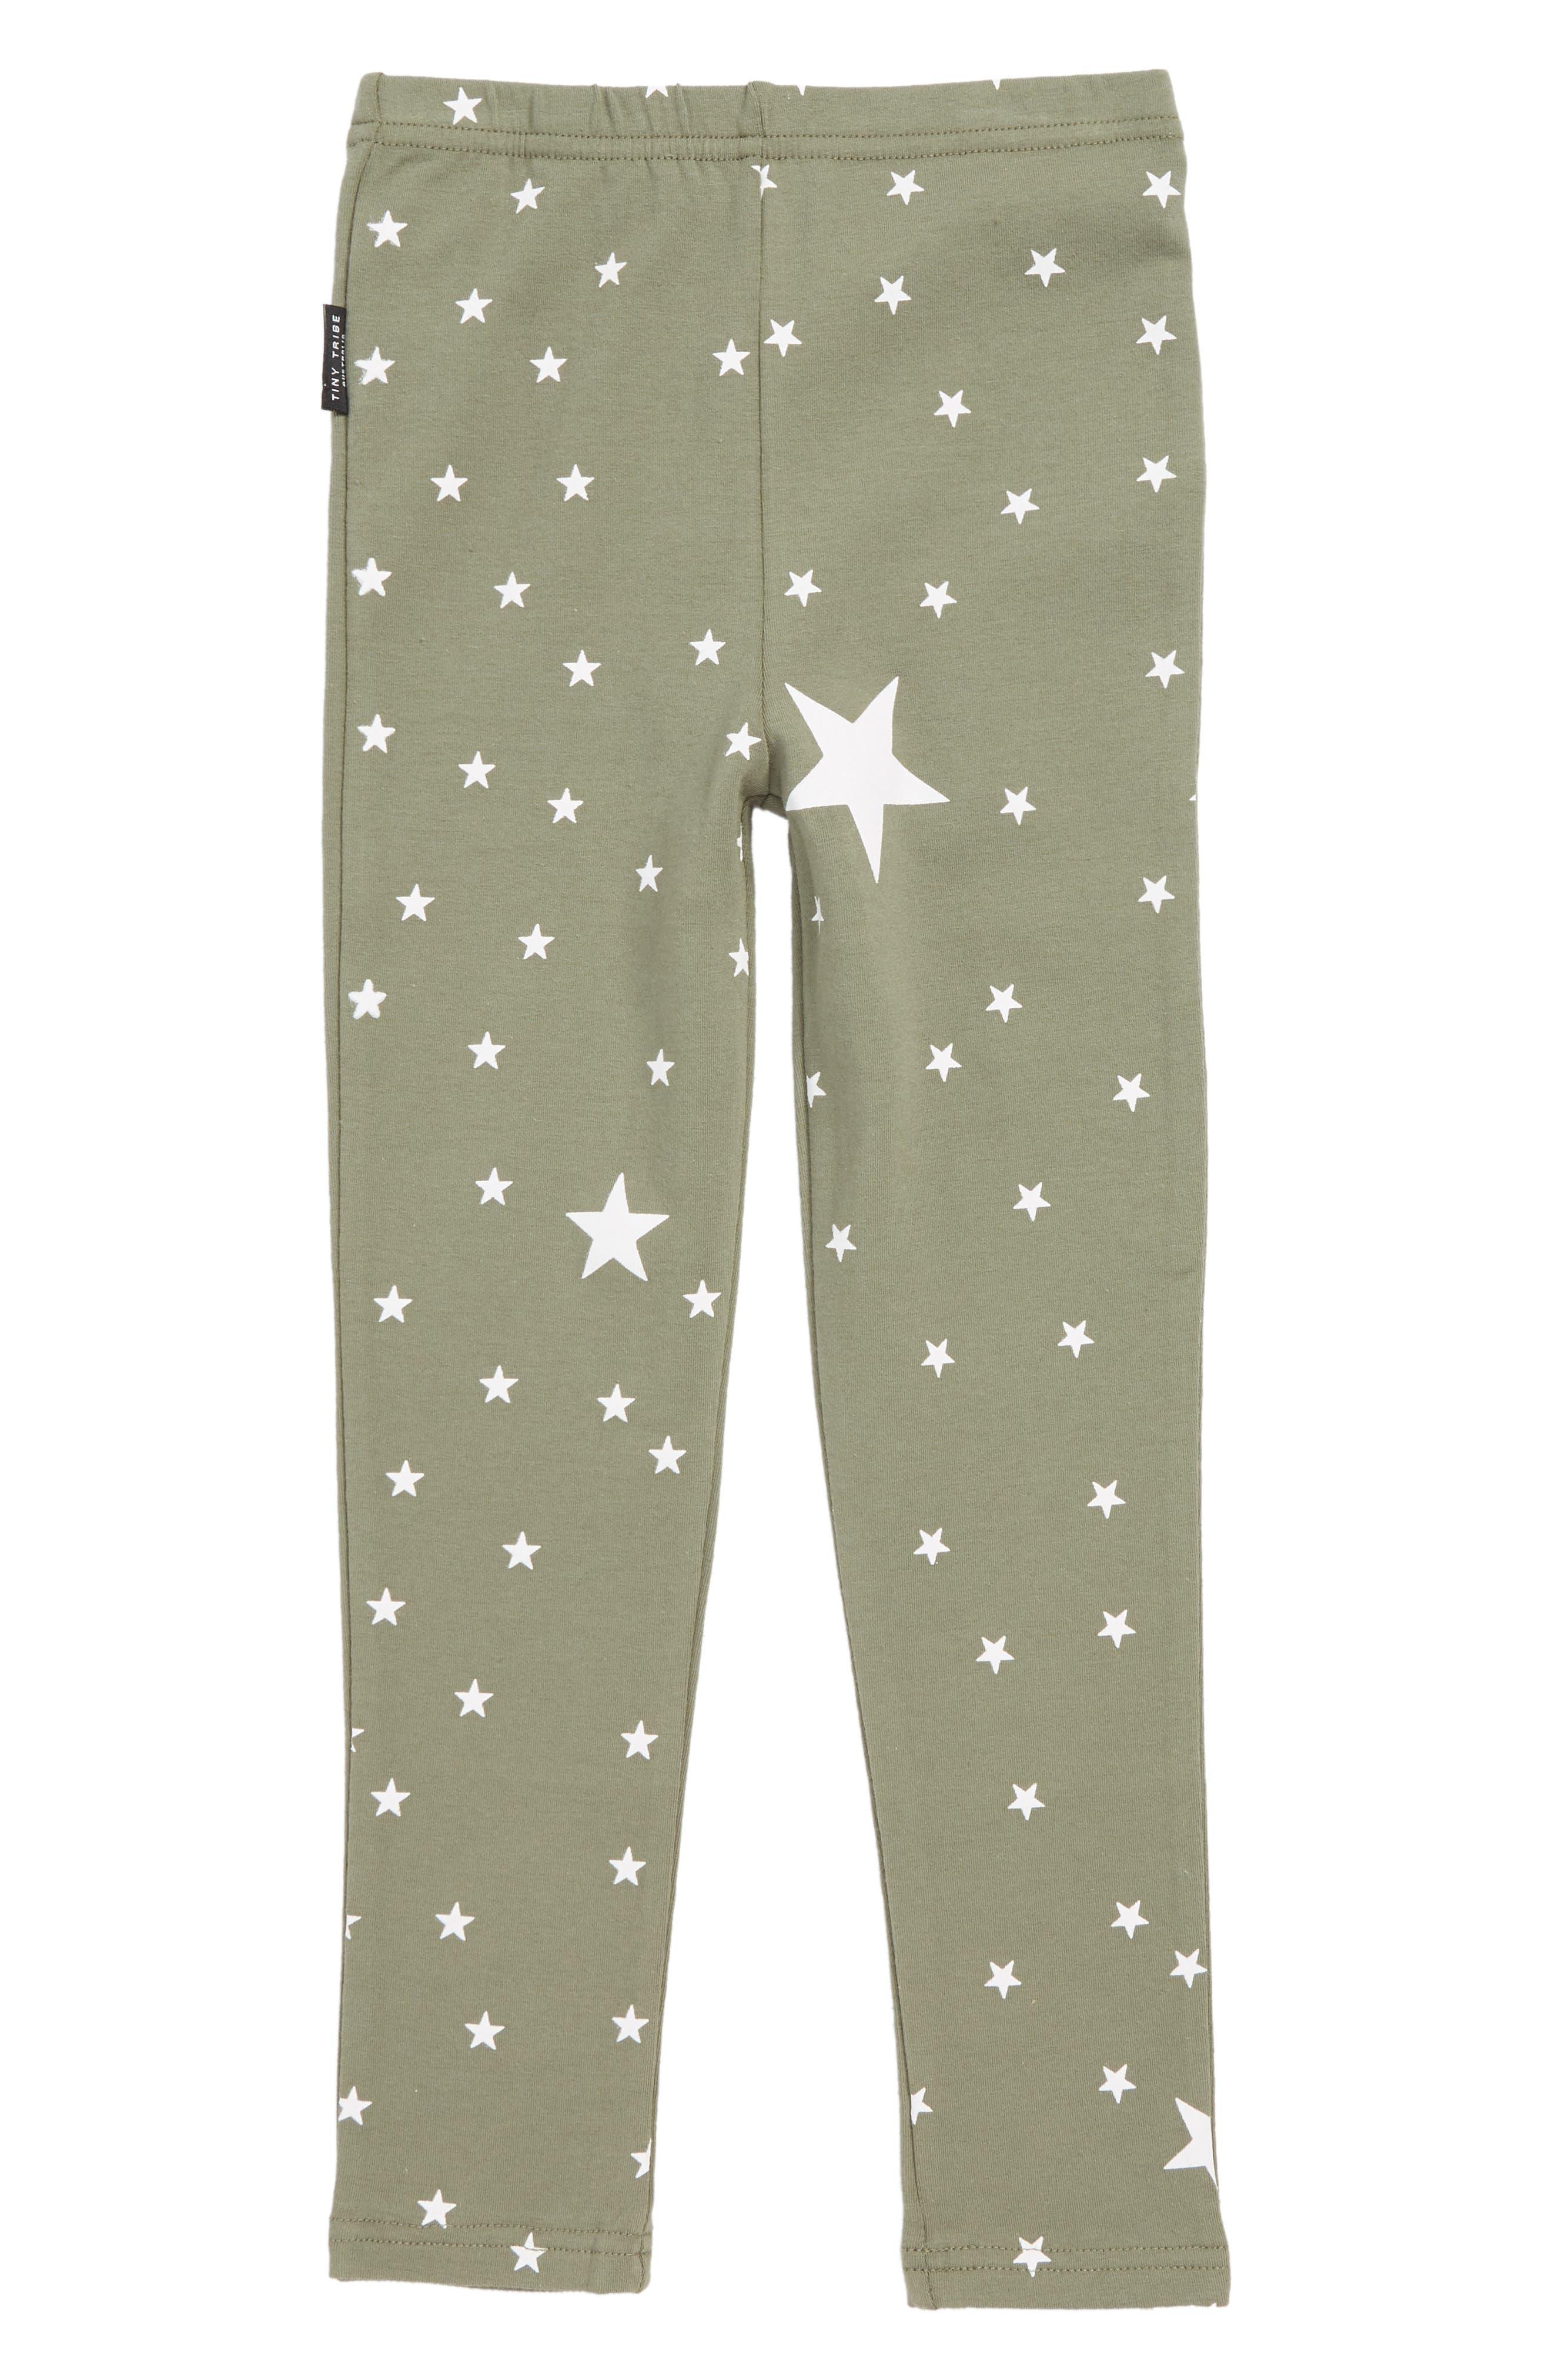 Toddler Girls Tiny Tribe Star Print Leggings Size 3T US  3 AUS  Green